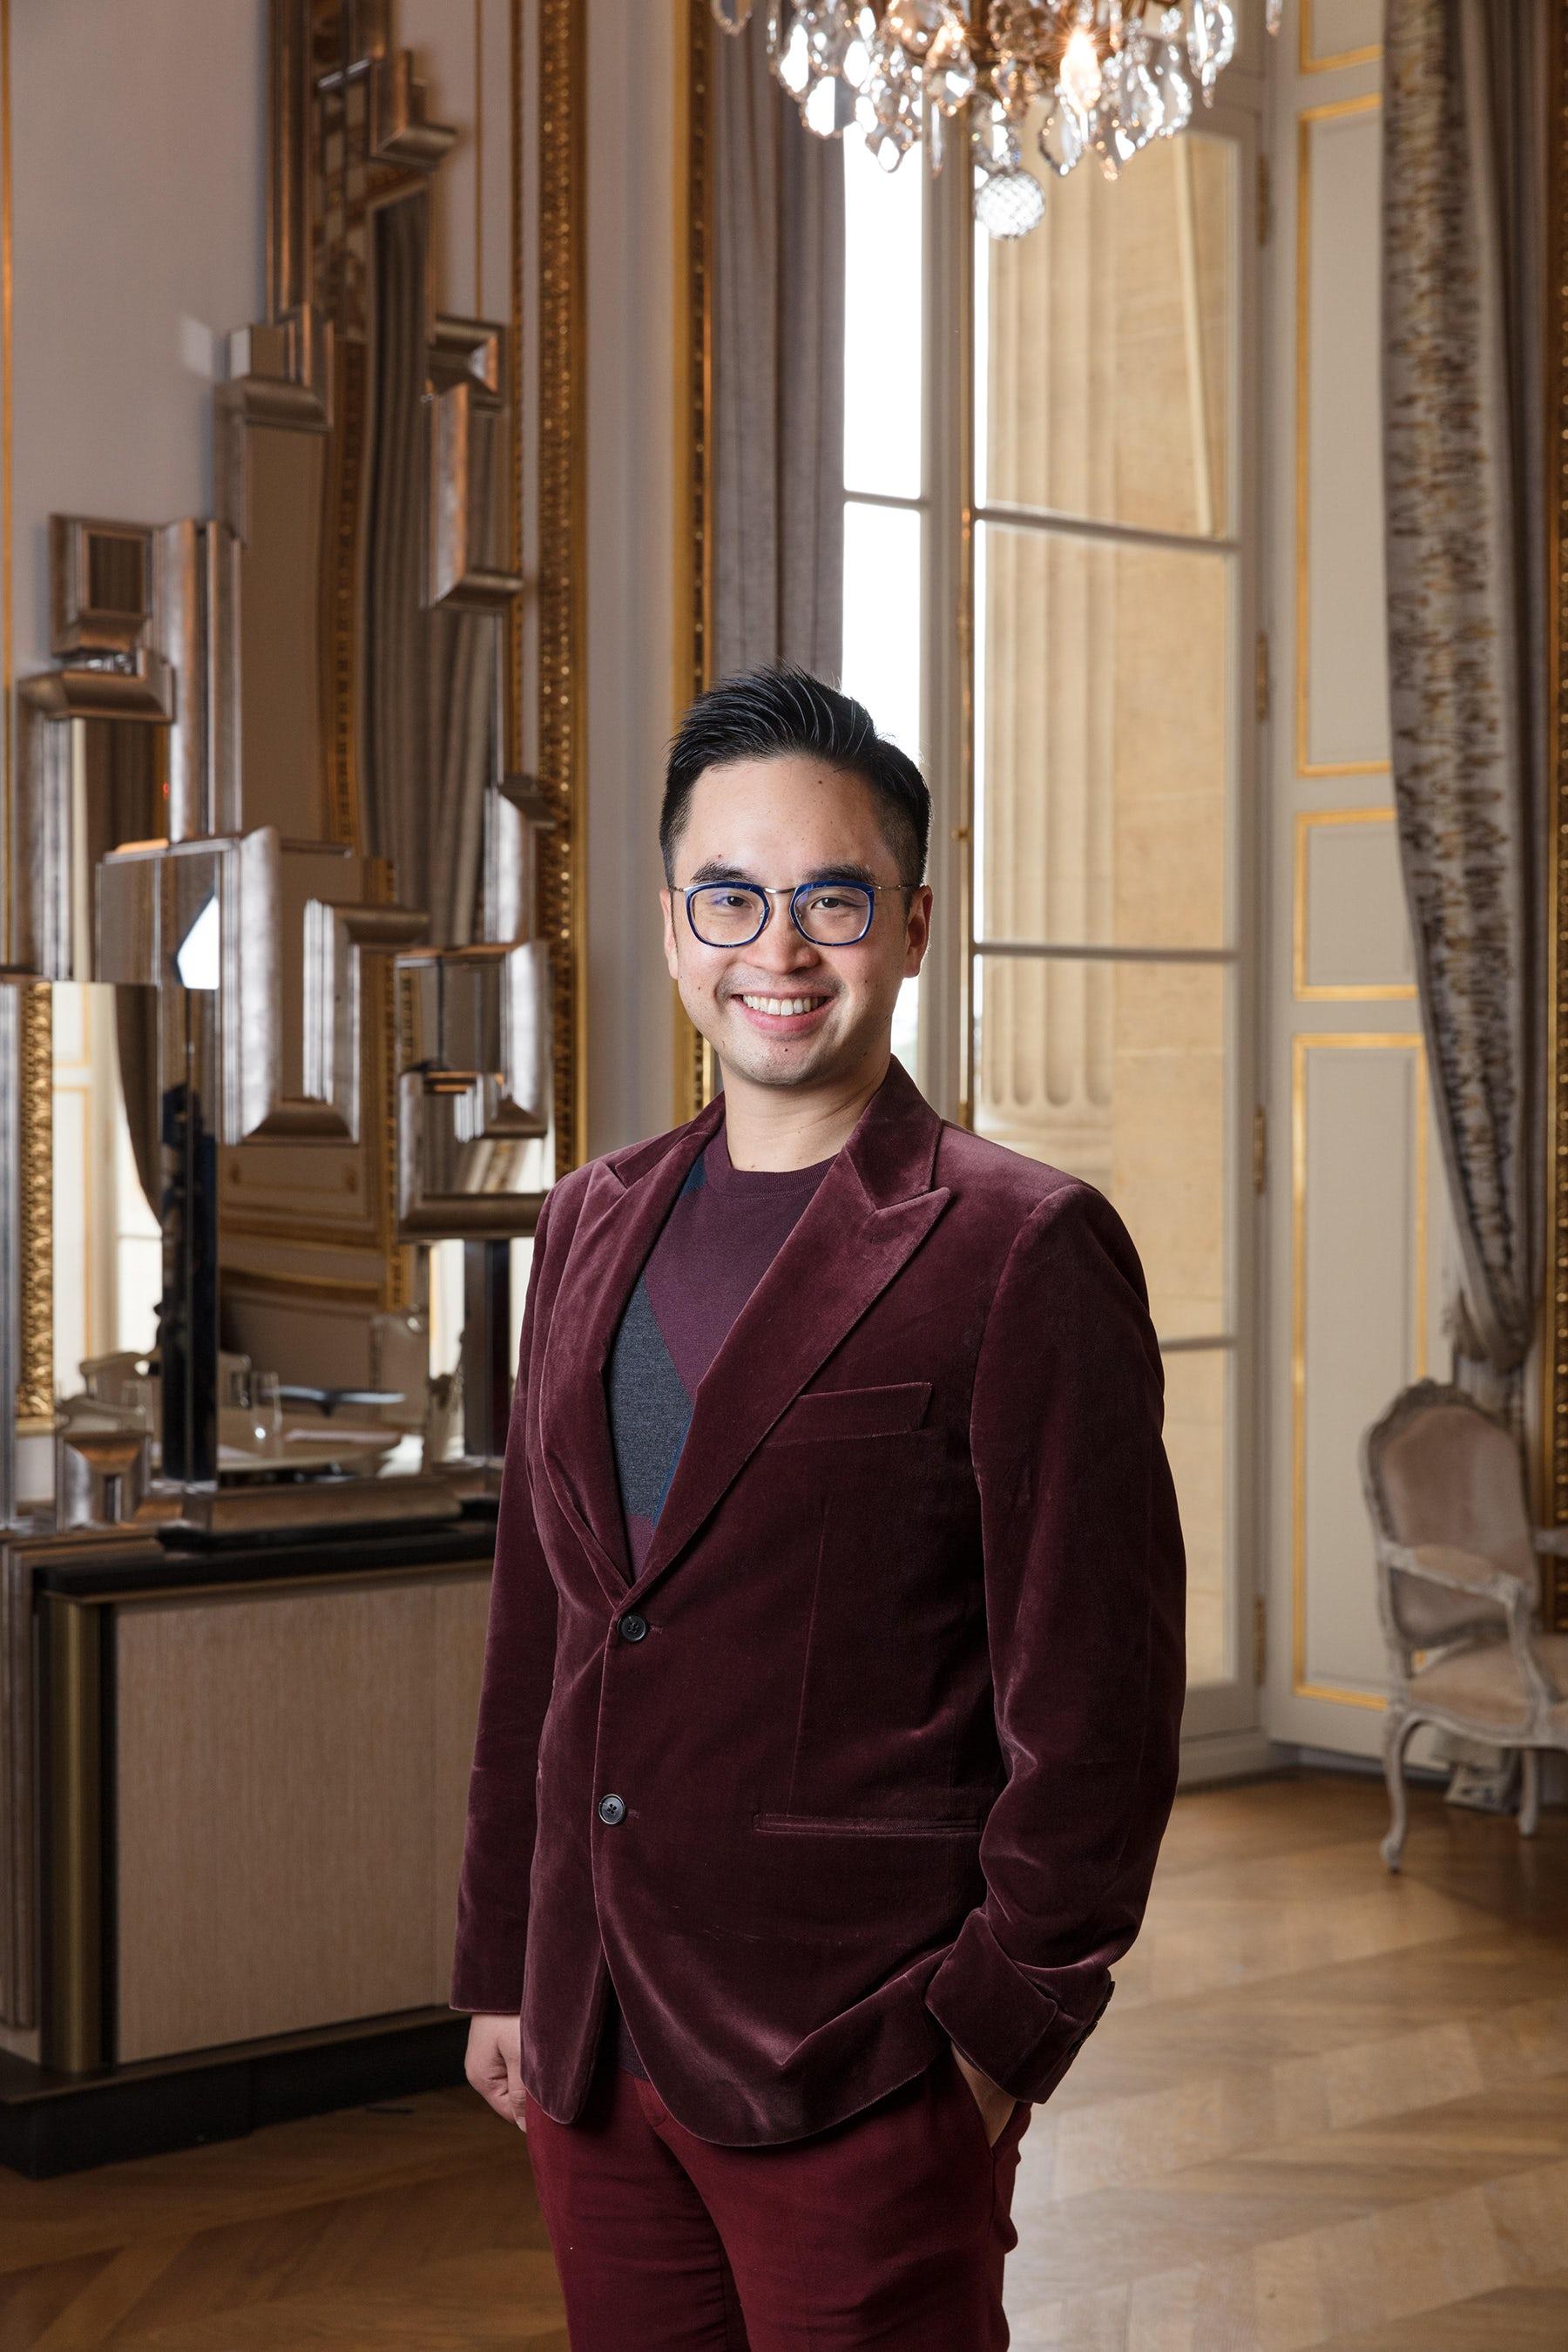 Adrian Cheng | Courtesy, photo by David Atlan